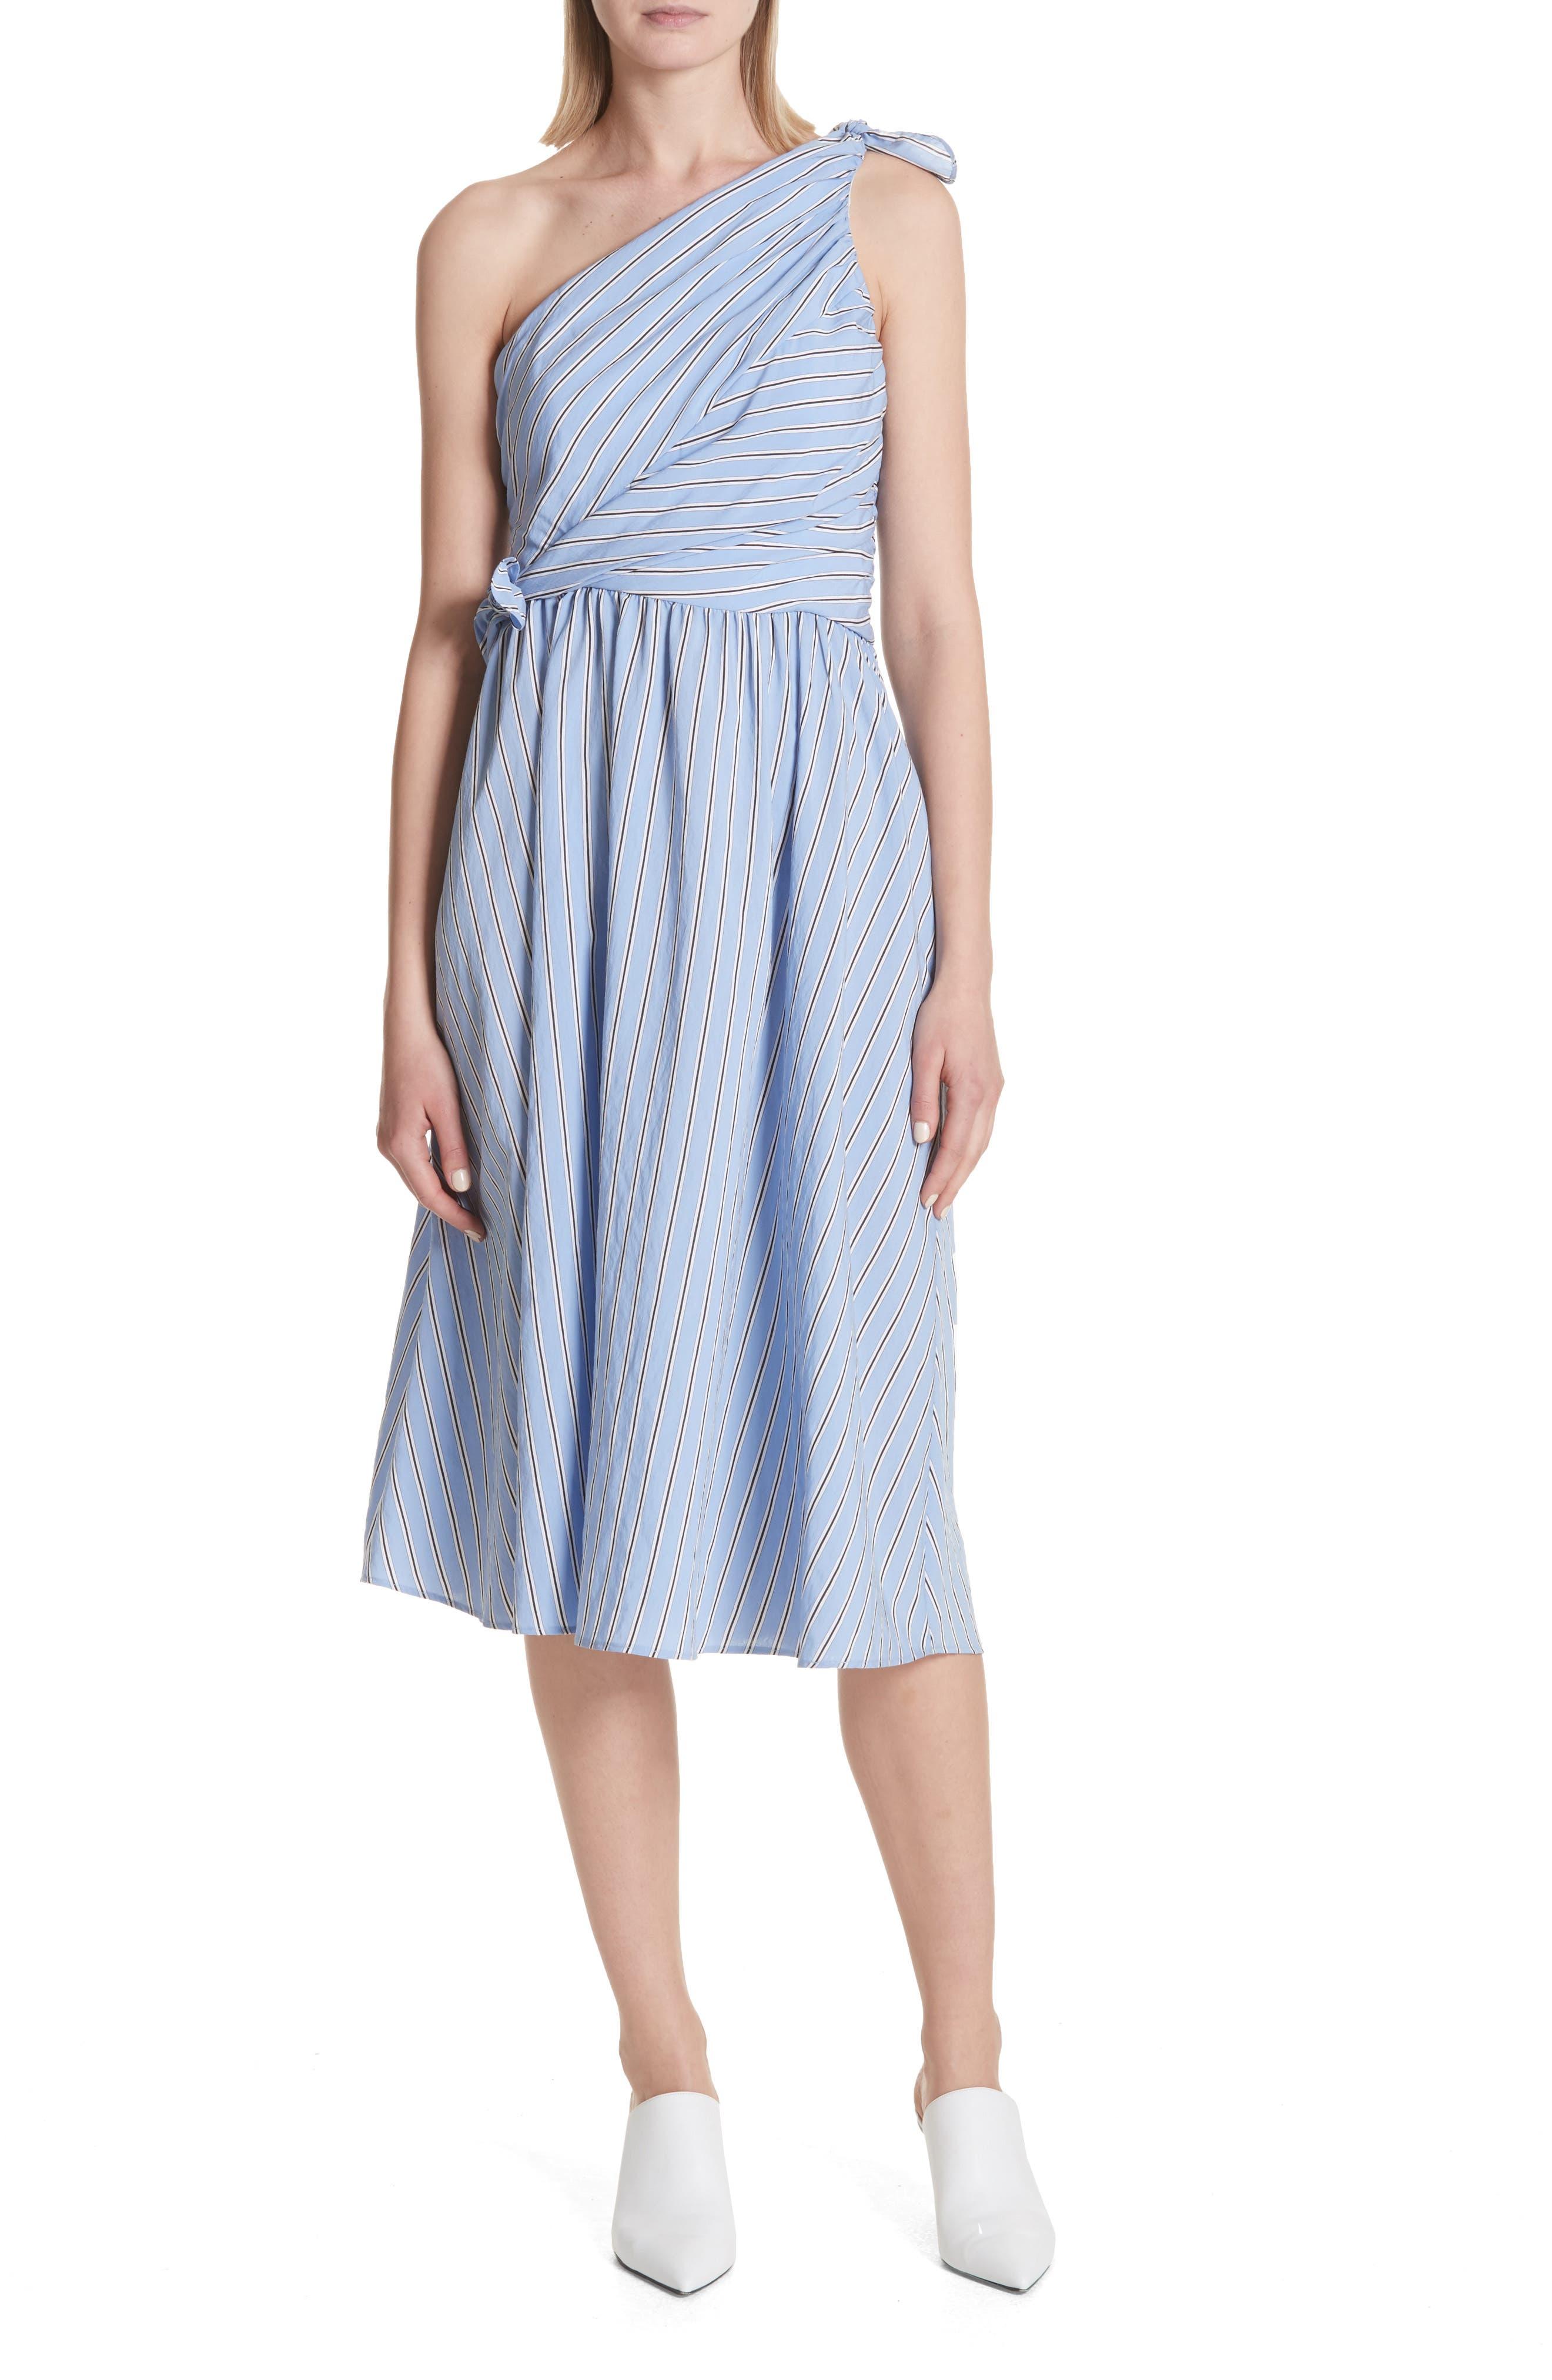 Cabrera Stripe One-Shoulder Dress,                         Main,                         color, 420